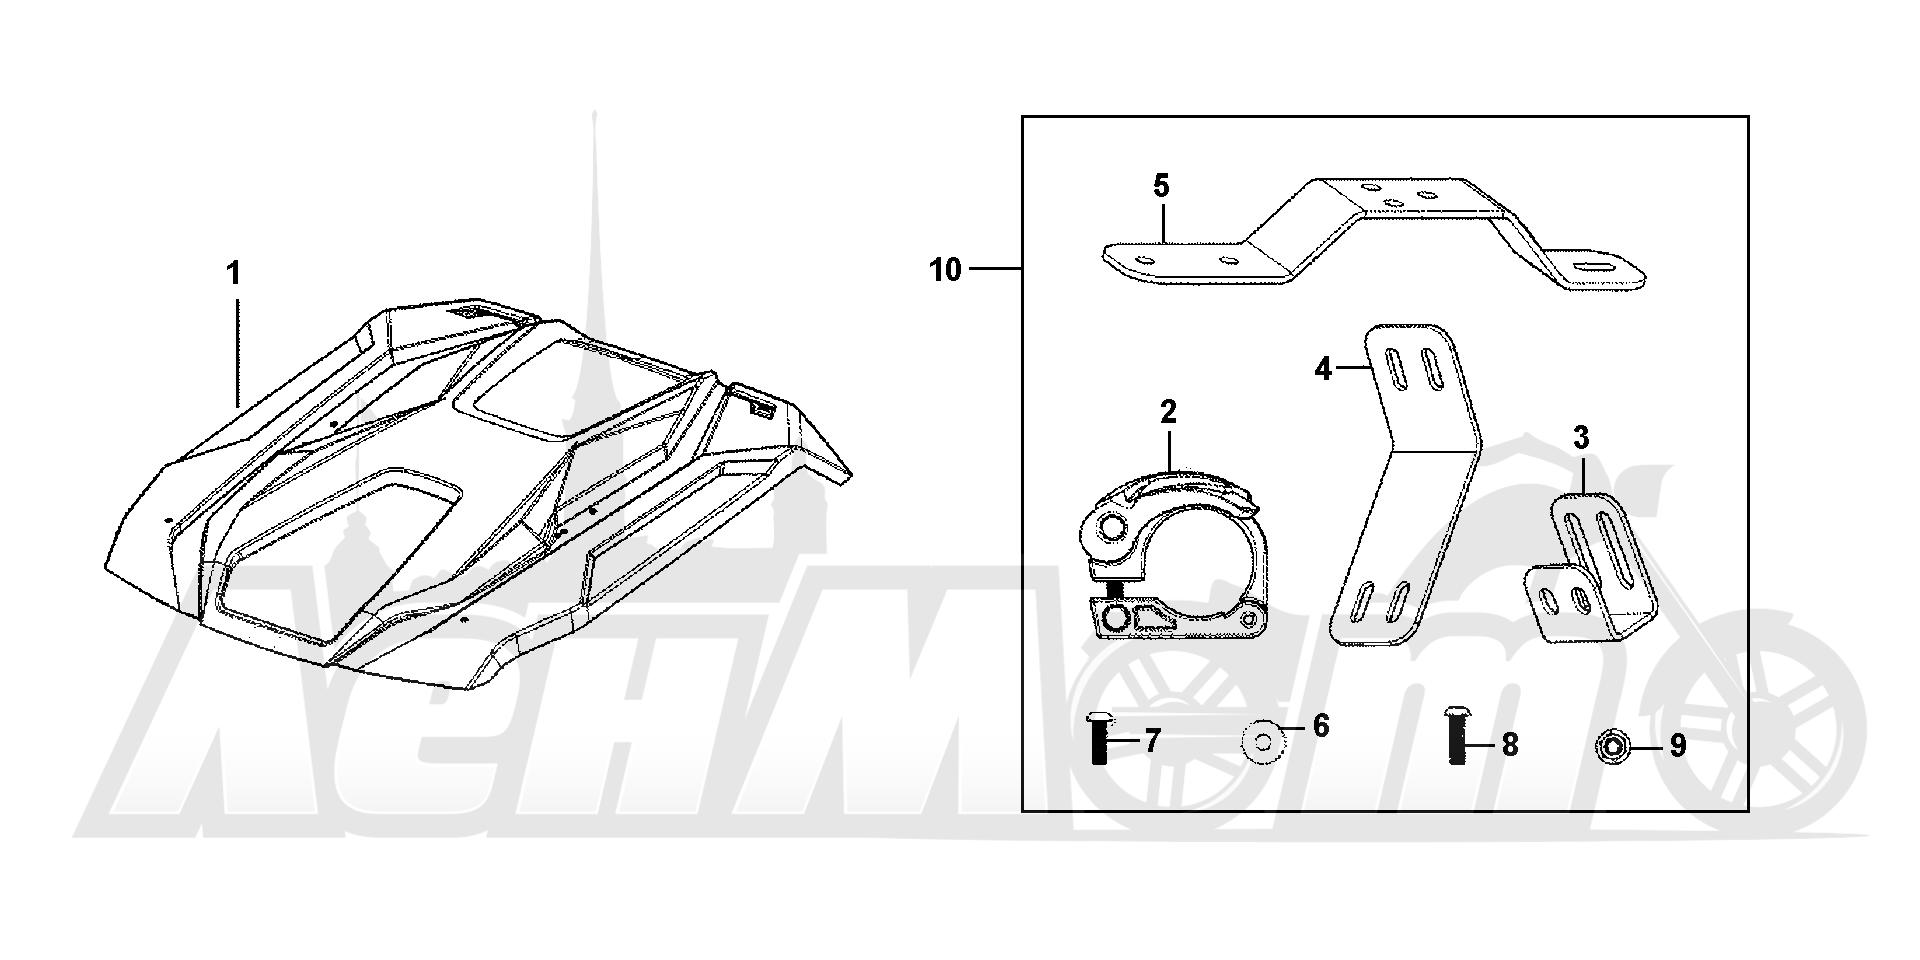 Запчасти для Квадроцикла Honda 2019 SXS1000M5P Раздел: HARD ROOF (5P) | HARD крыша (5P)